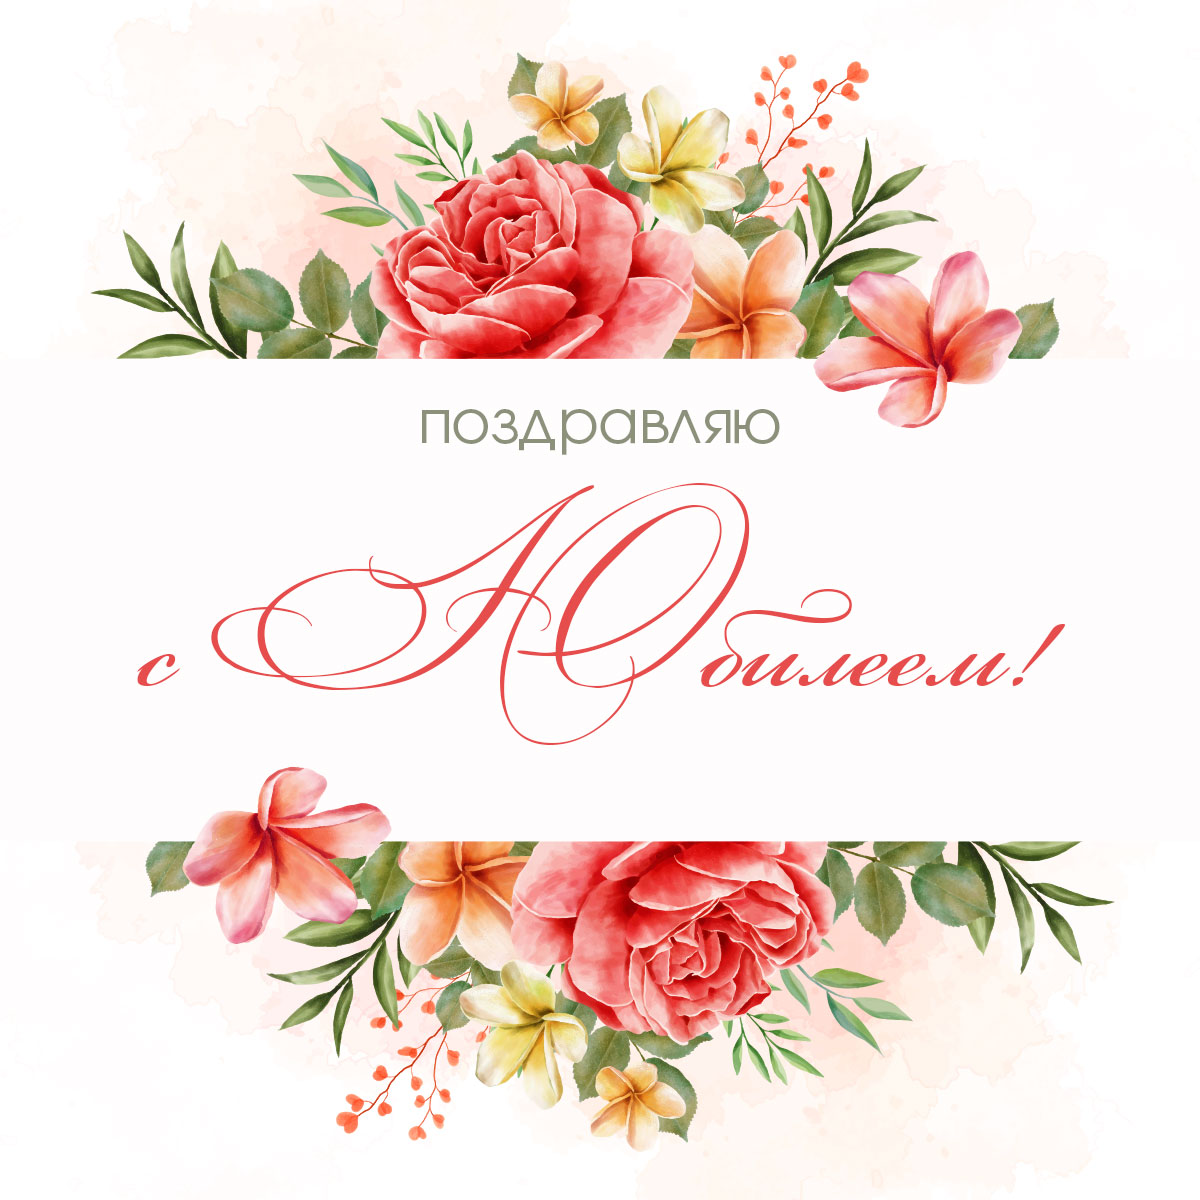 Картинка с розами и текстом поздравляю с юбилеем.